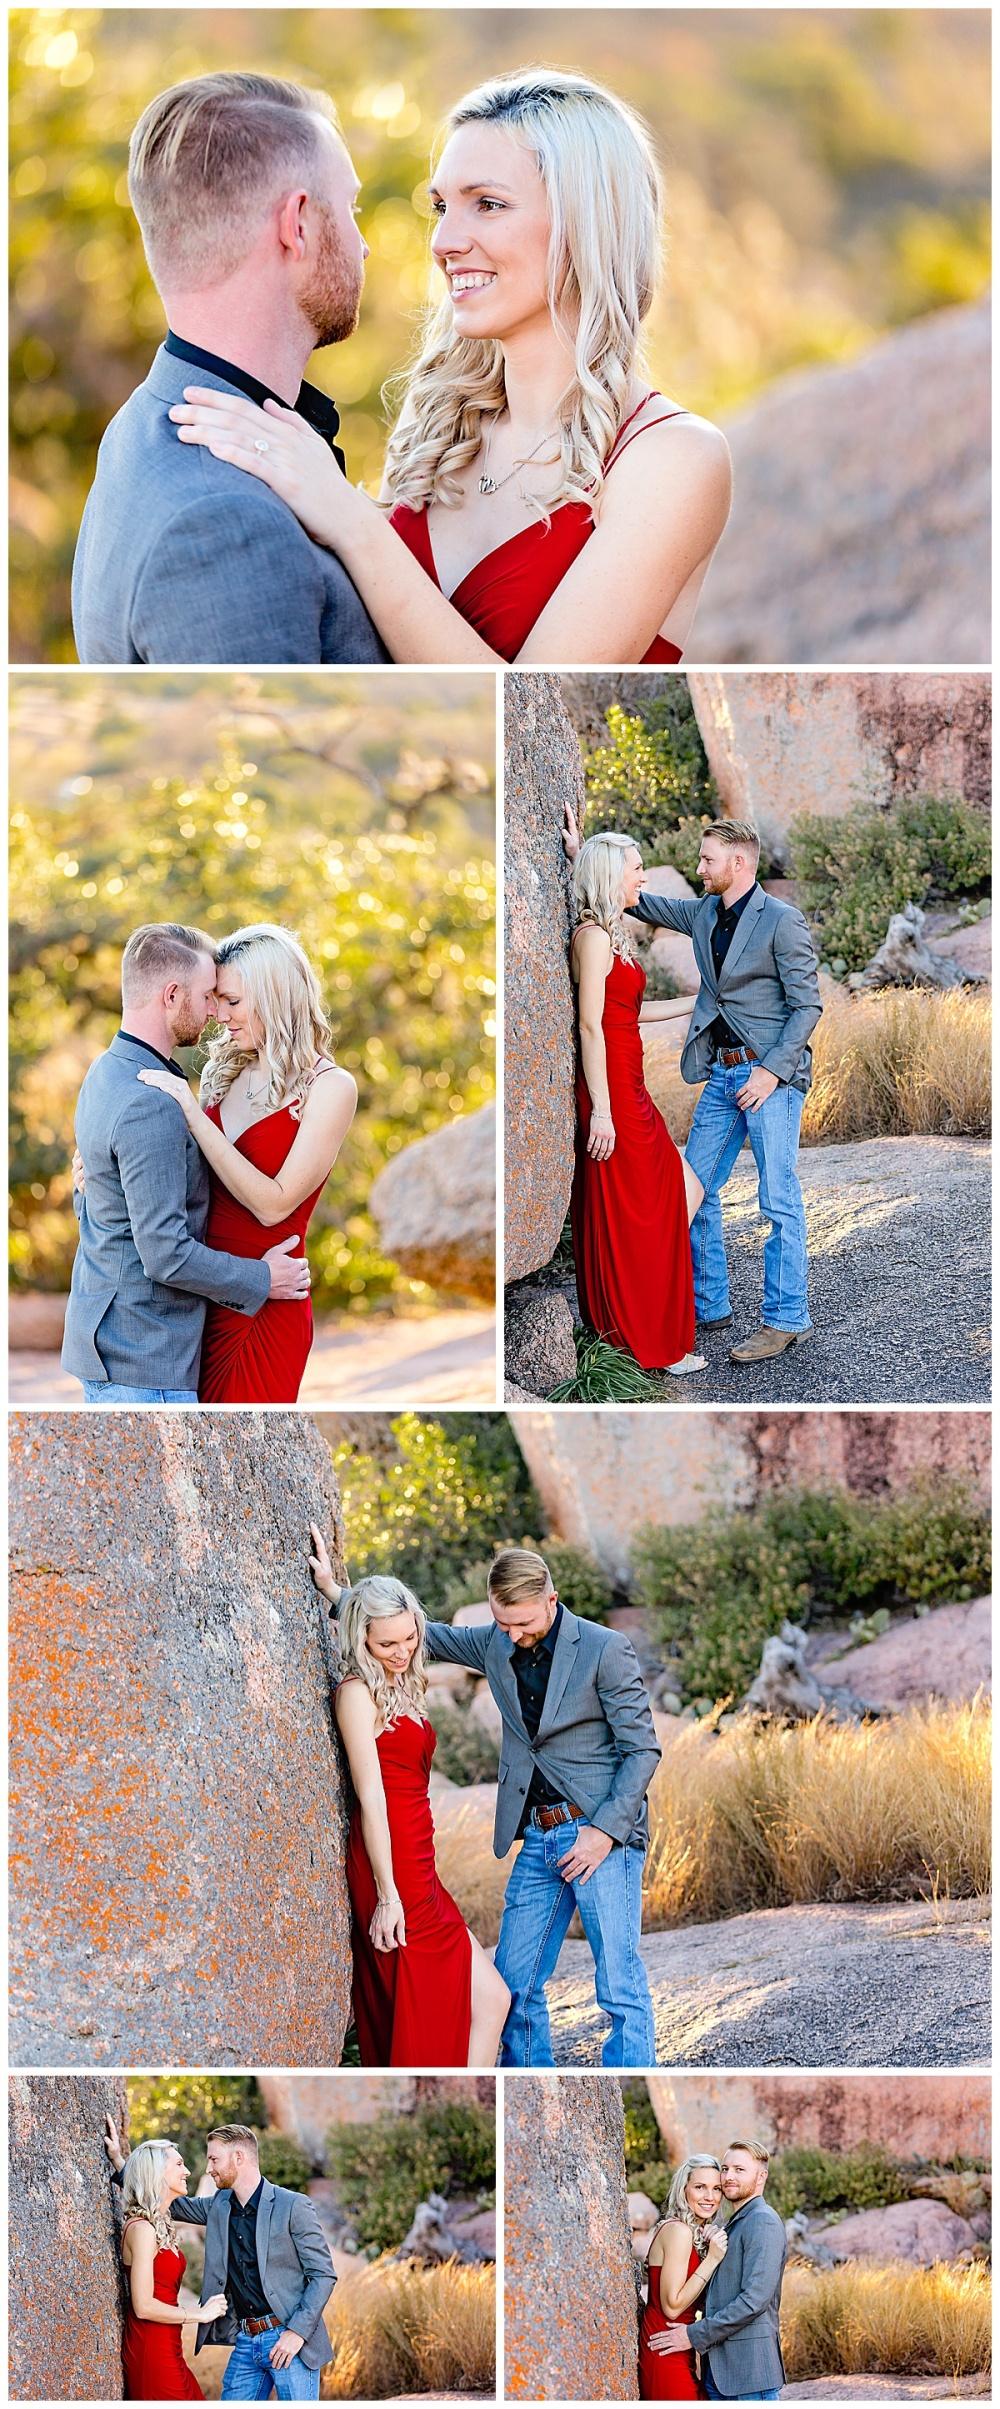 South-Texas-Wedding-Photographer-Engagement-Photos-Enchanted-Rock-Fredericksburg-Sunset-Couples-Carly-Barton-Photography_0007.jpg